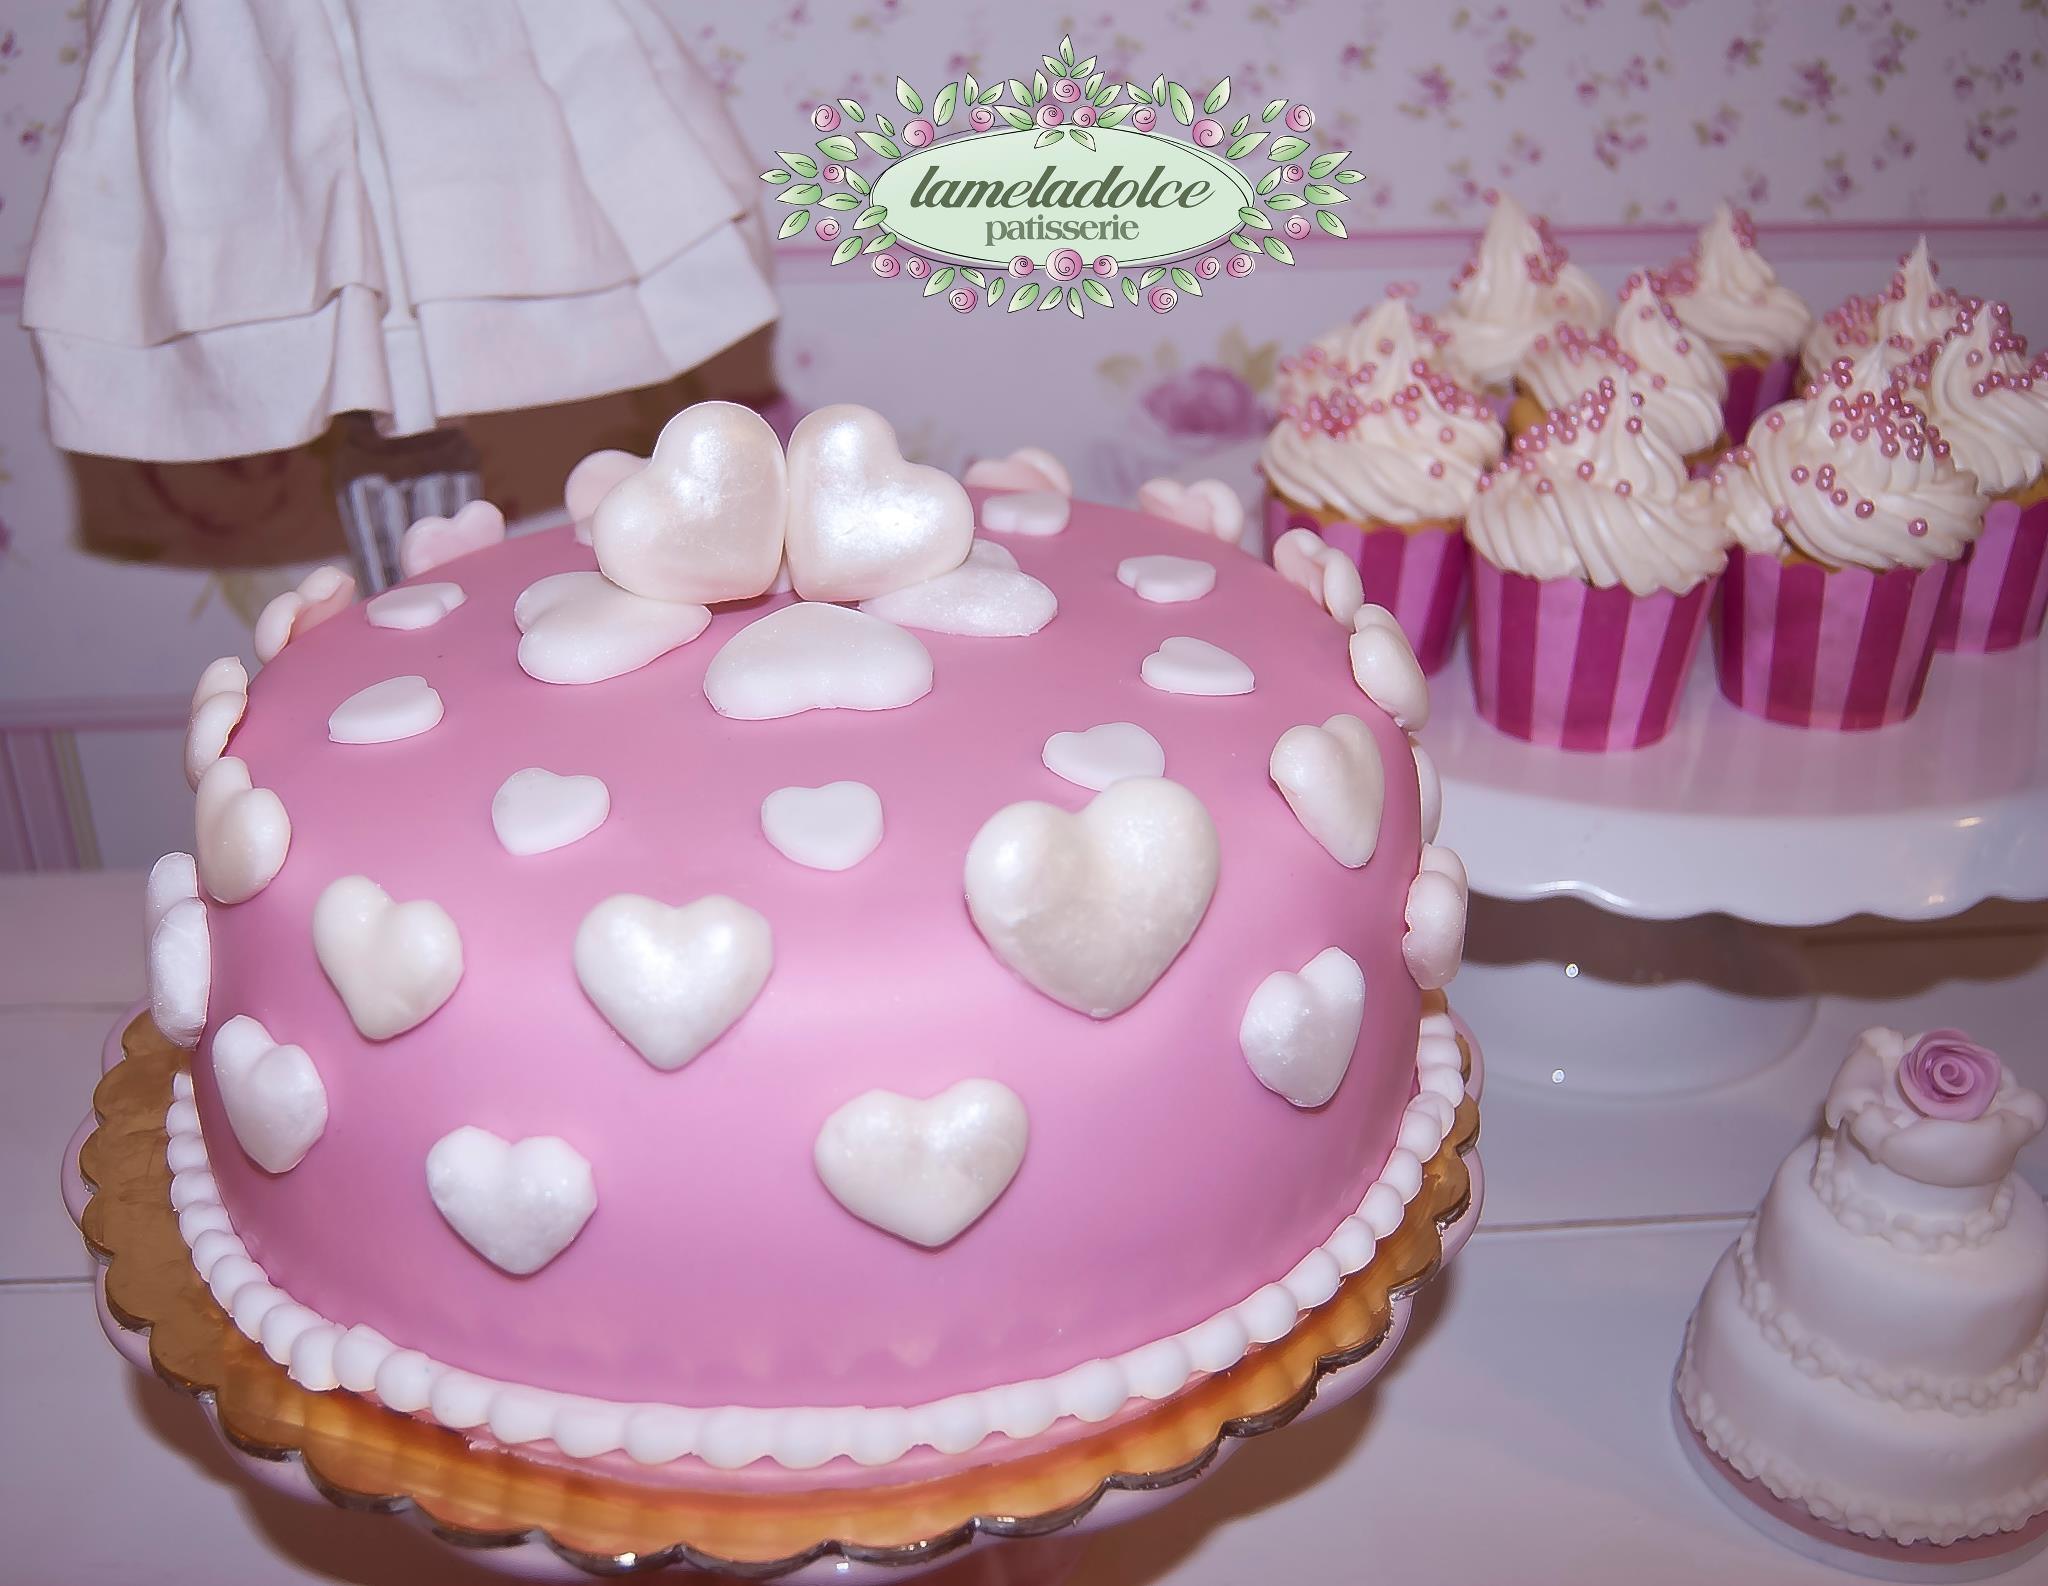 Torte Cake Design Per Bambini Immagini : Le torte di Carmen